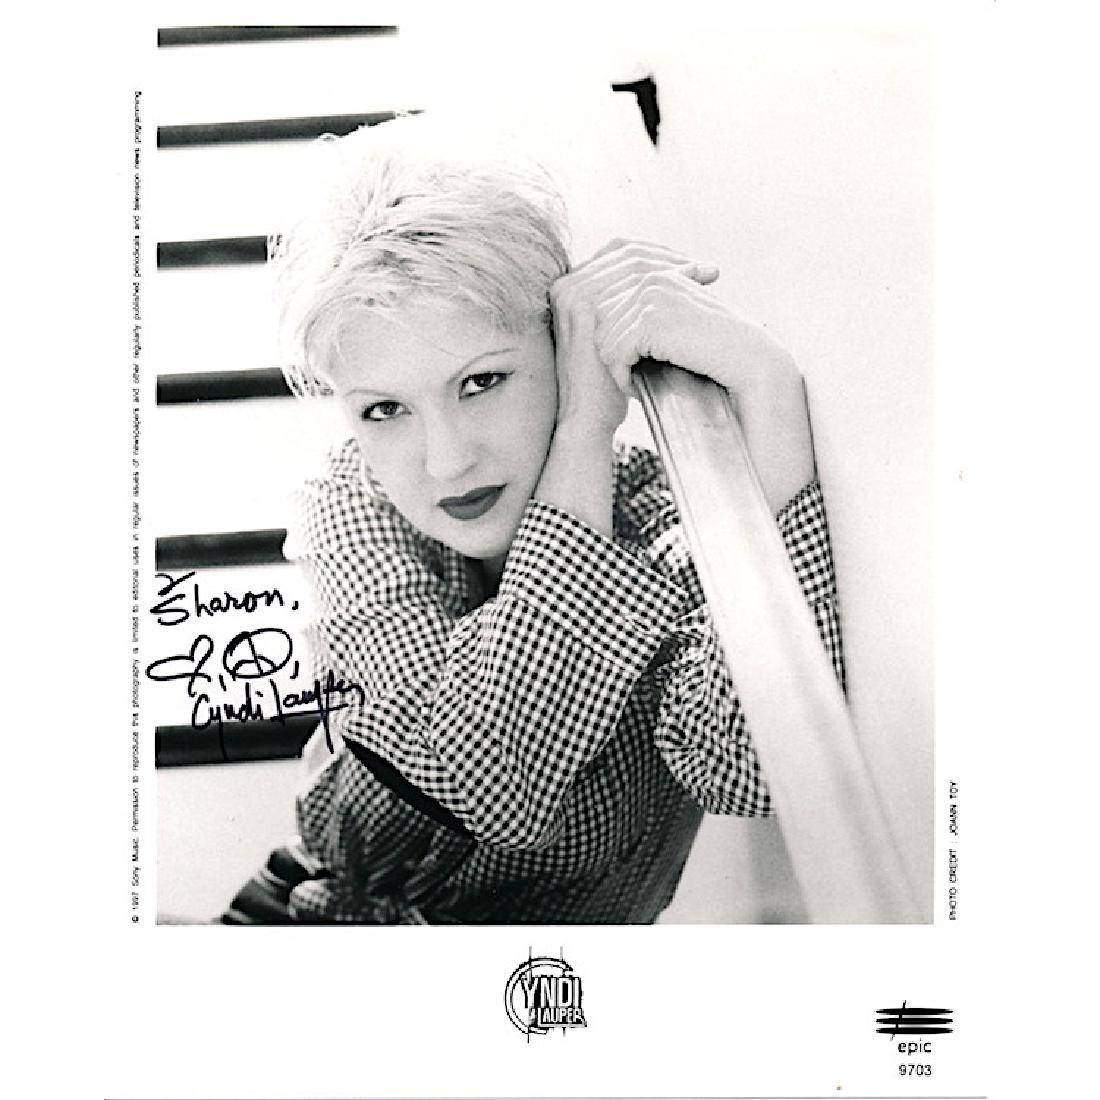 Cyndi Lauper Autographed Photograph